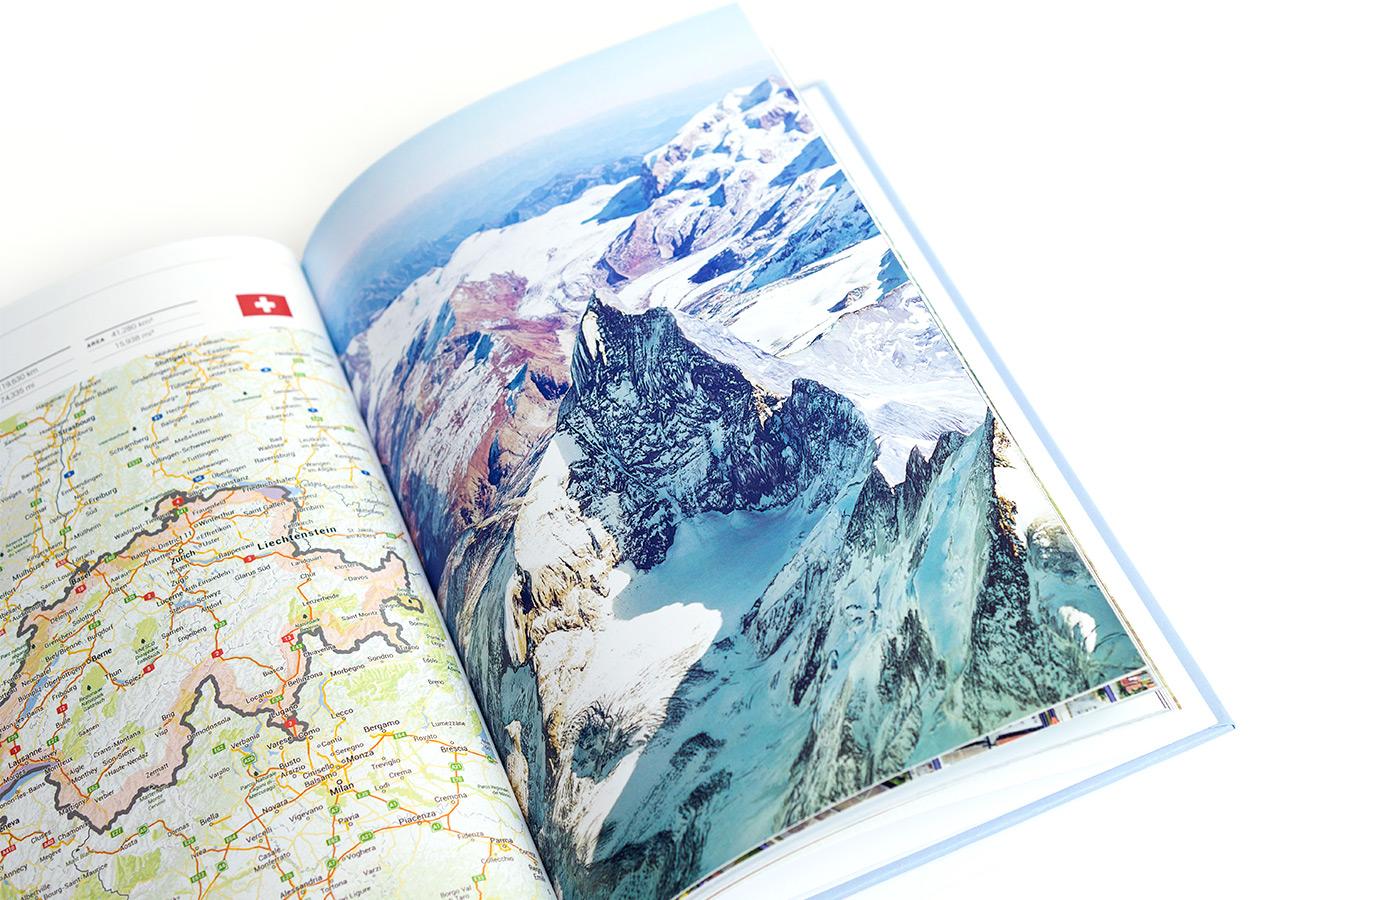 http://carlbeanlarson.com/files/gimgs/32_google-maps-atlas-08-switzerland.jpg